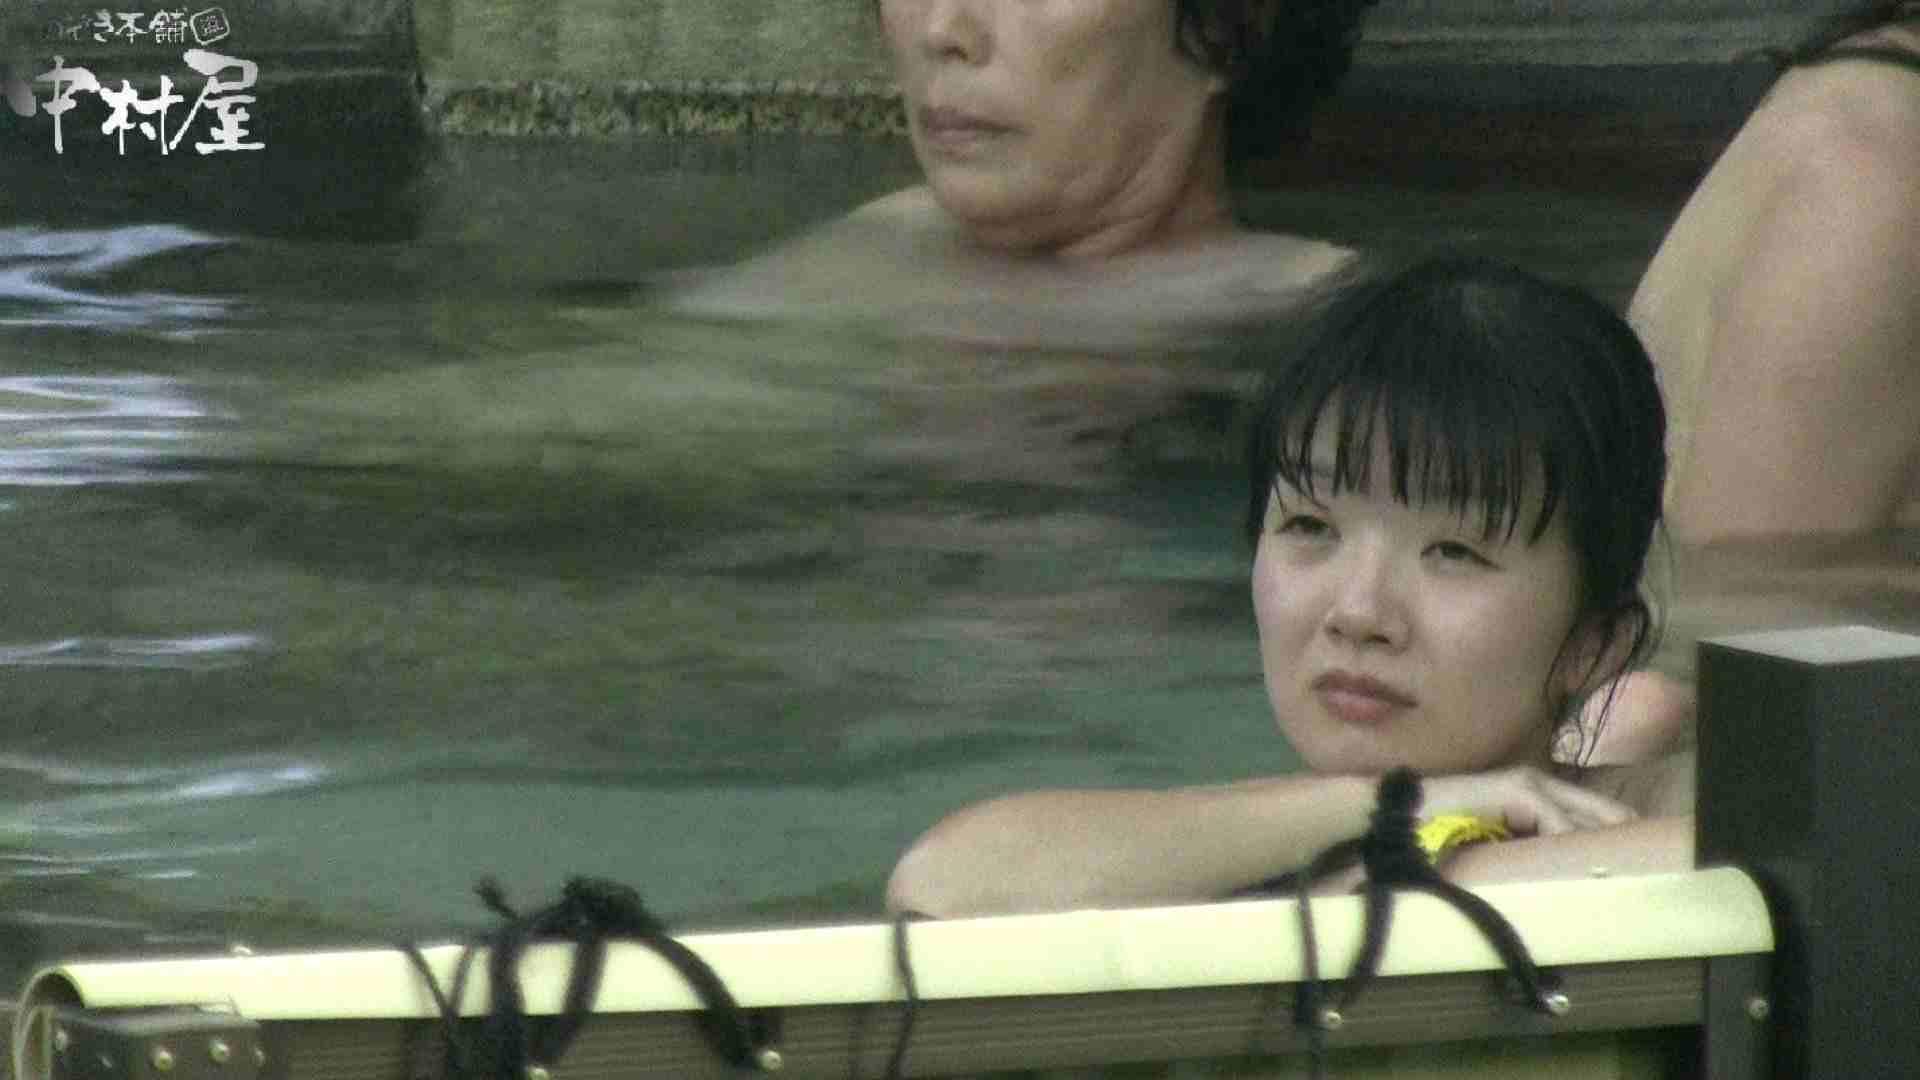 Aquaな露天風呂Vol.904 OL  60連発 20